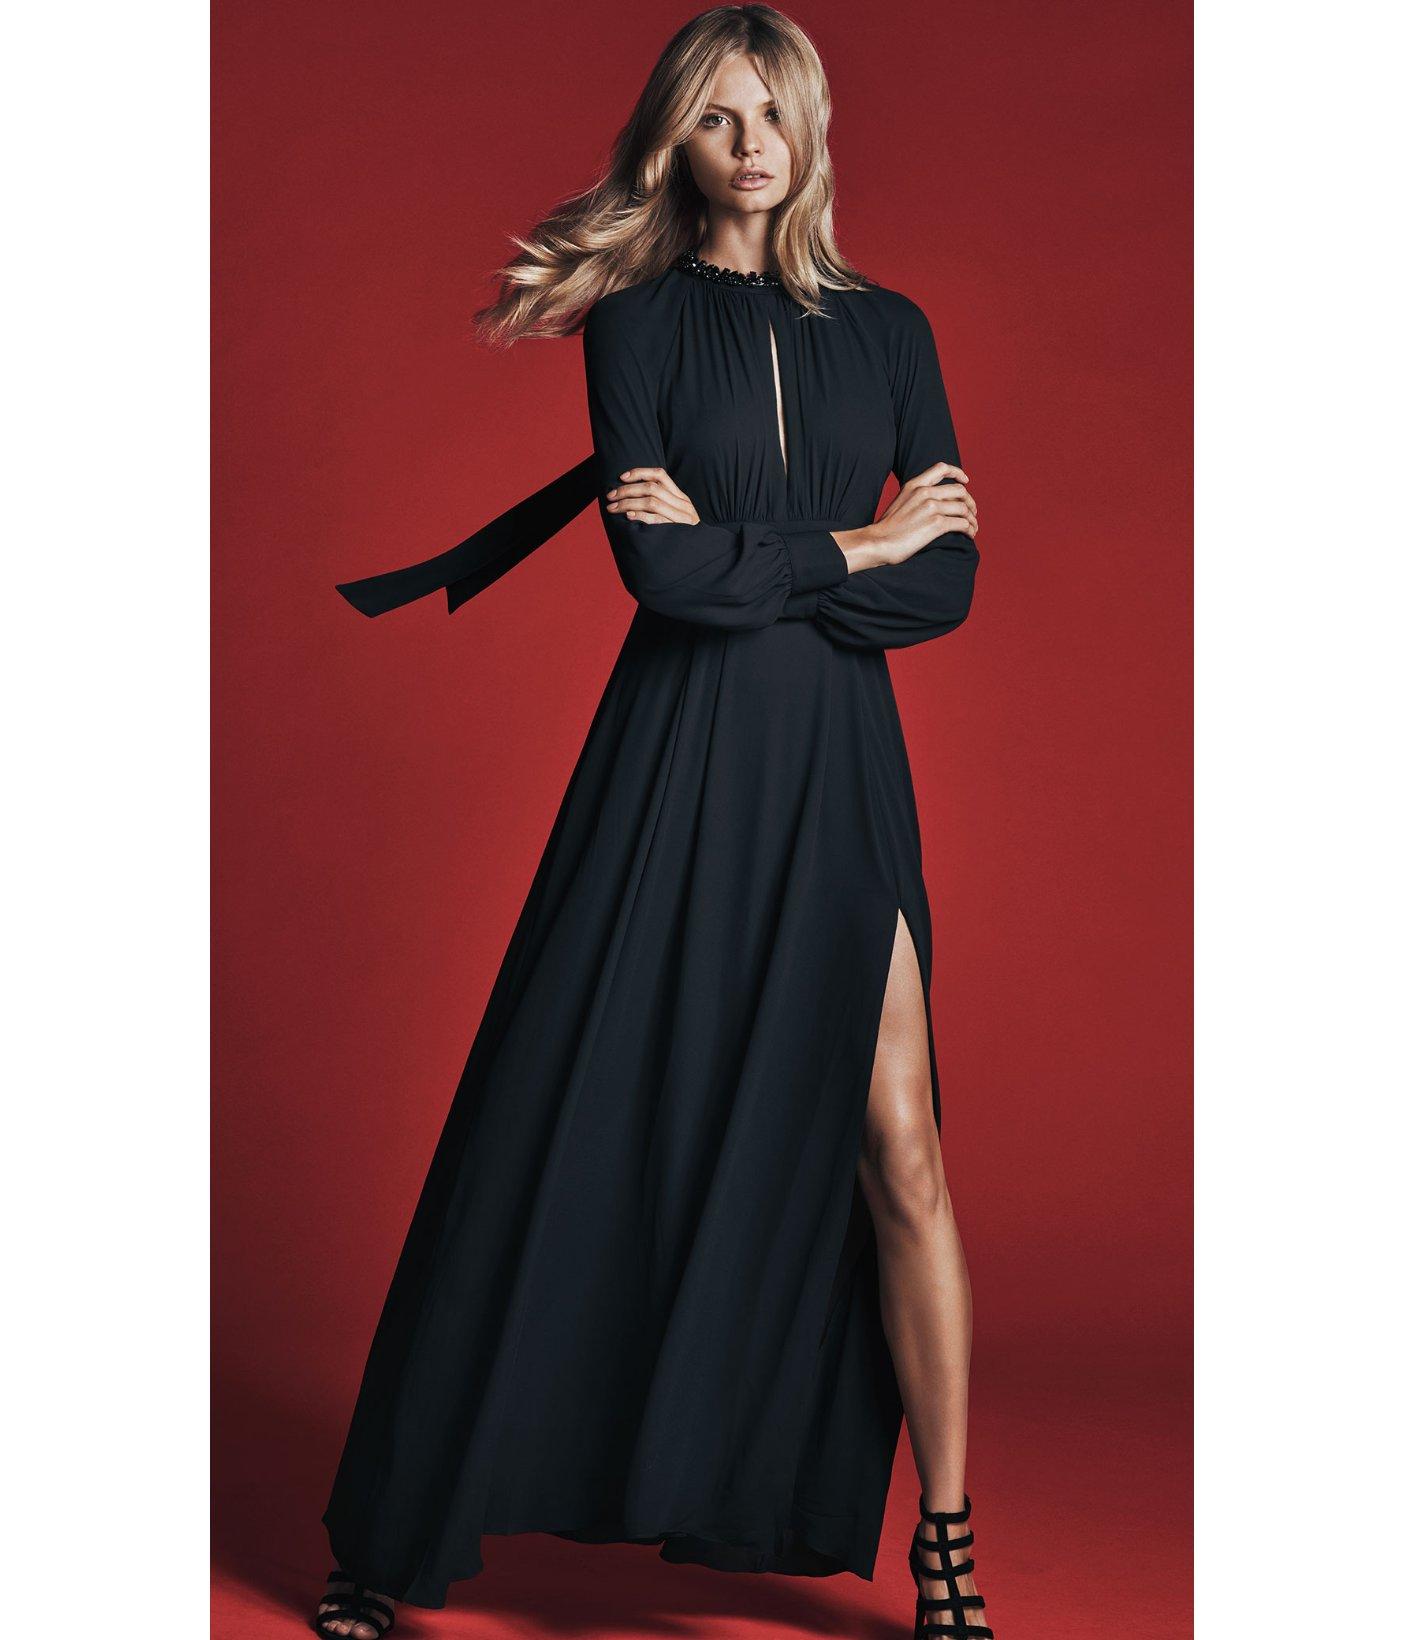 e33db8a273e Express Black Poet Sleeve Maxi Dress